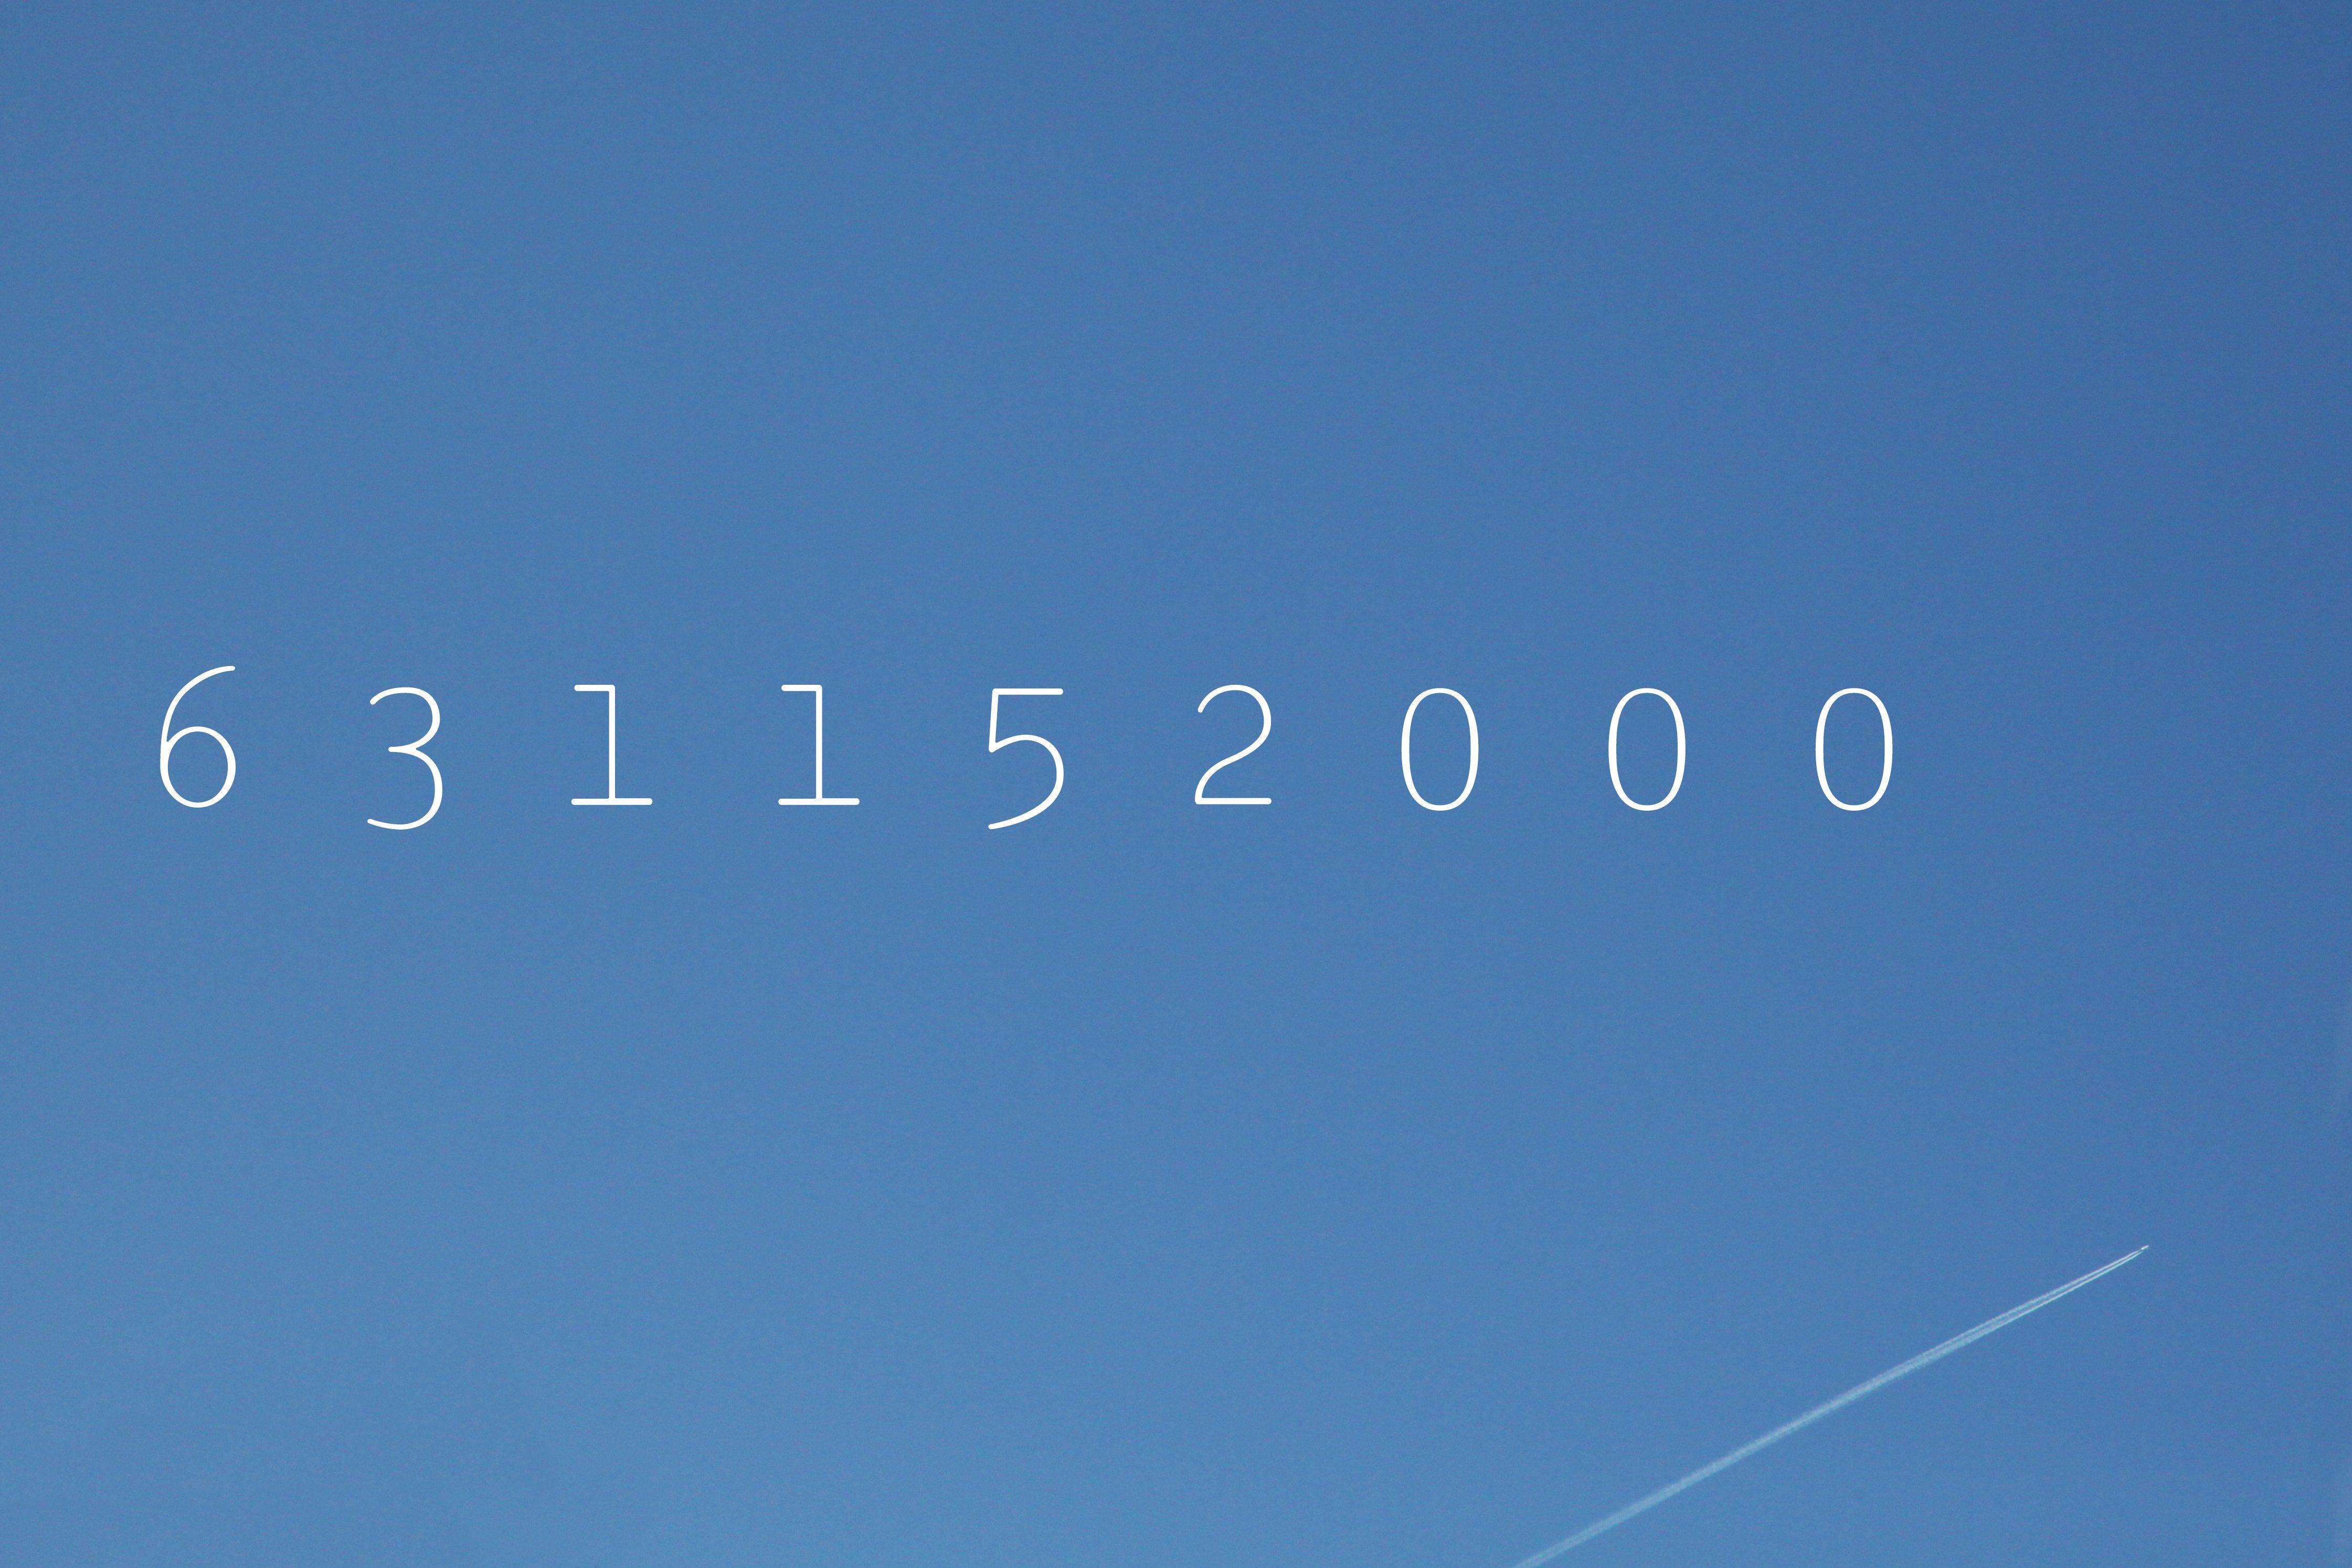 Leap Second, 31 December 1989 - 23:59:60